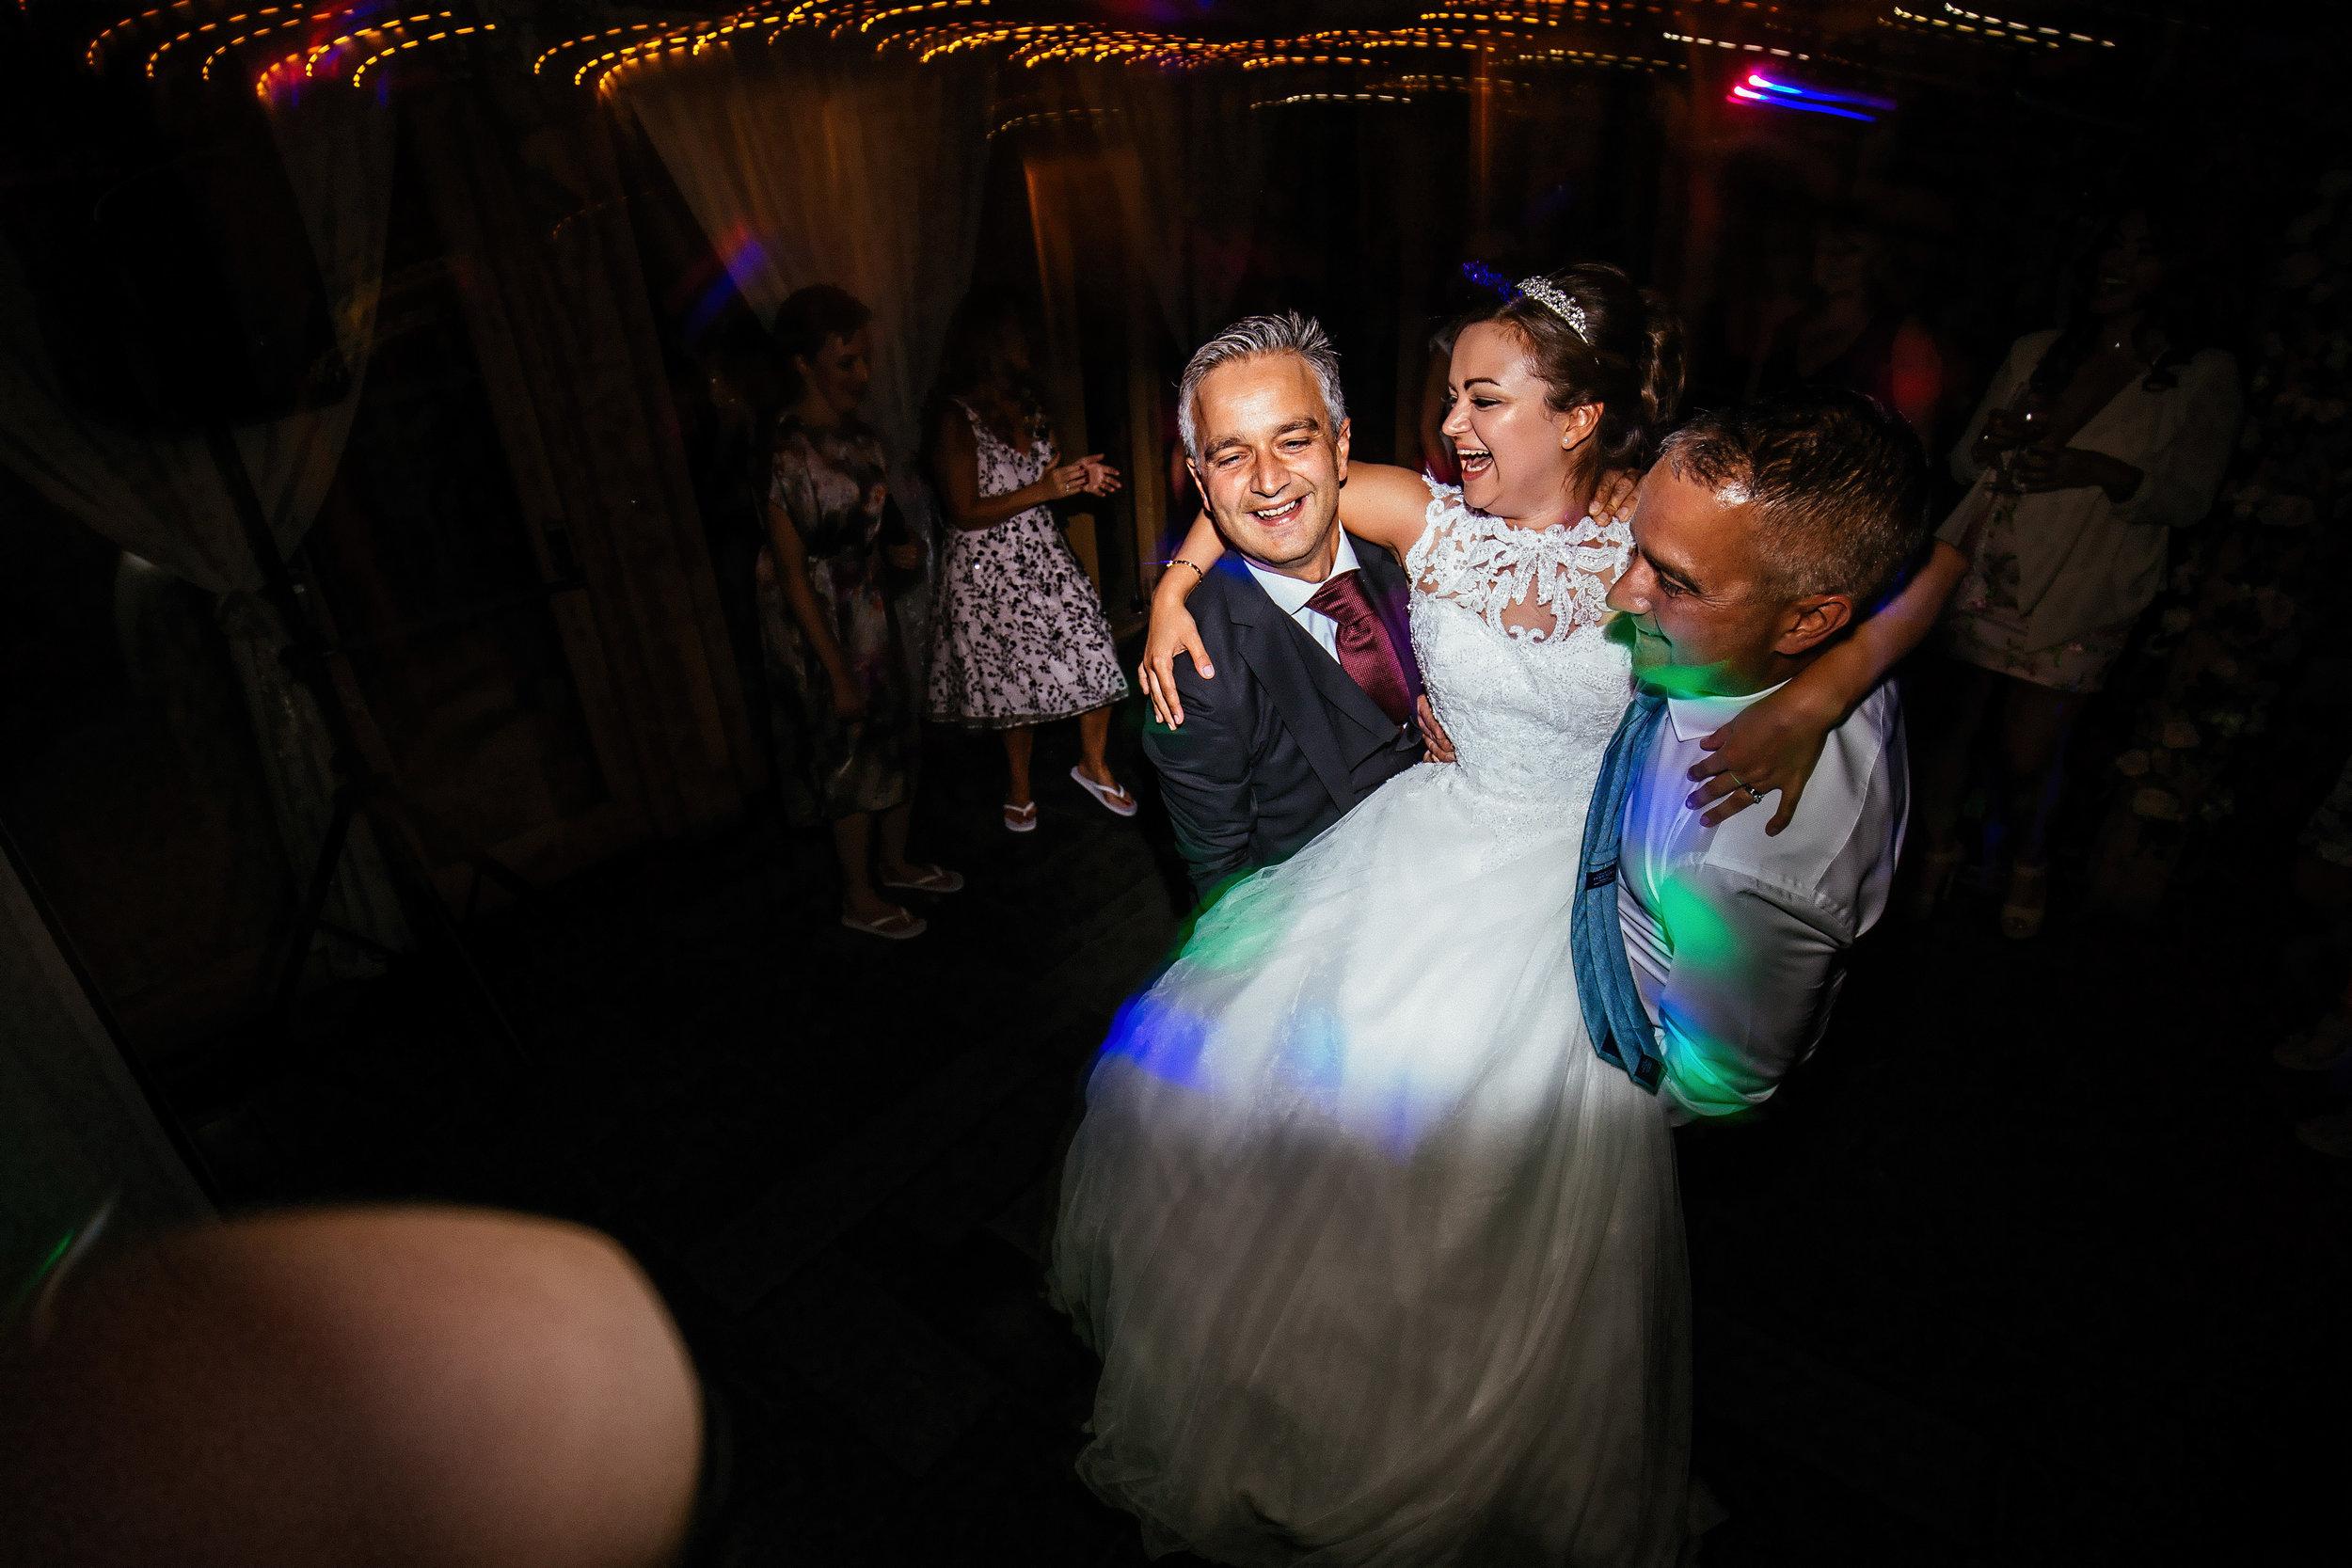 Emily-and-Peter-Wedding-Highlights-104.jpg